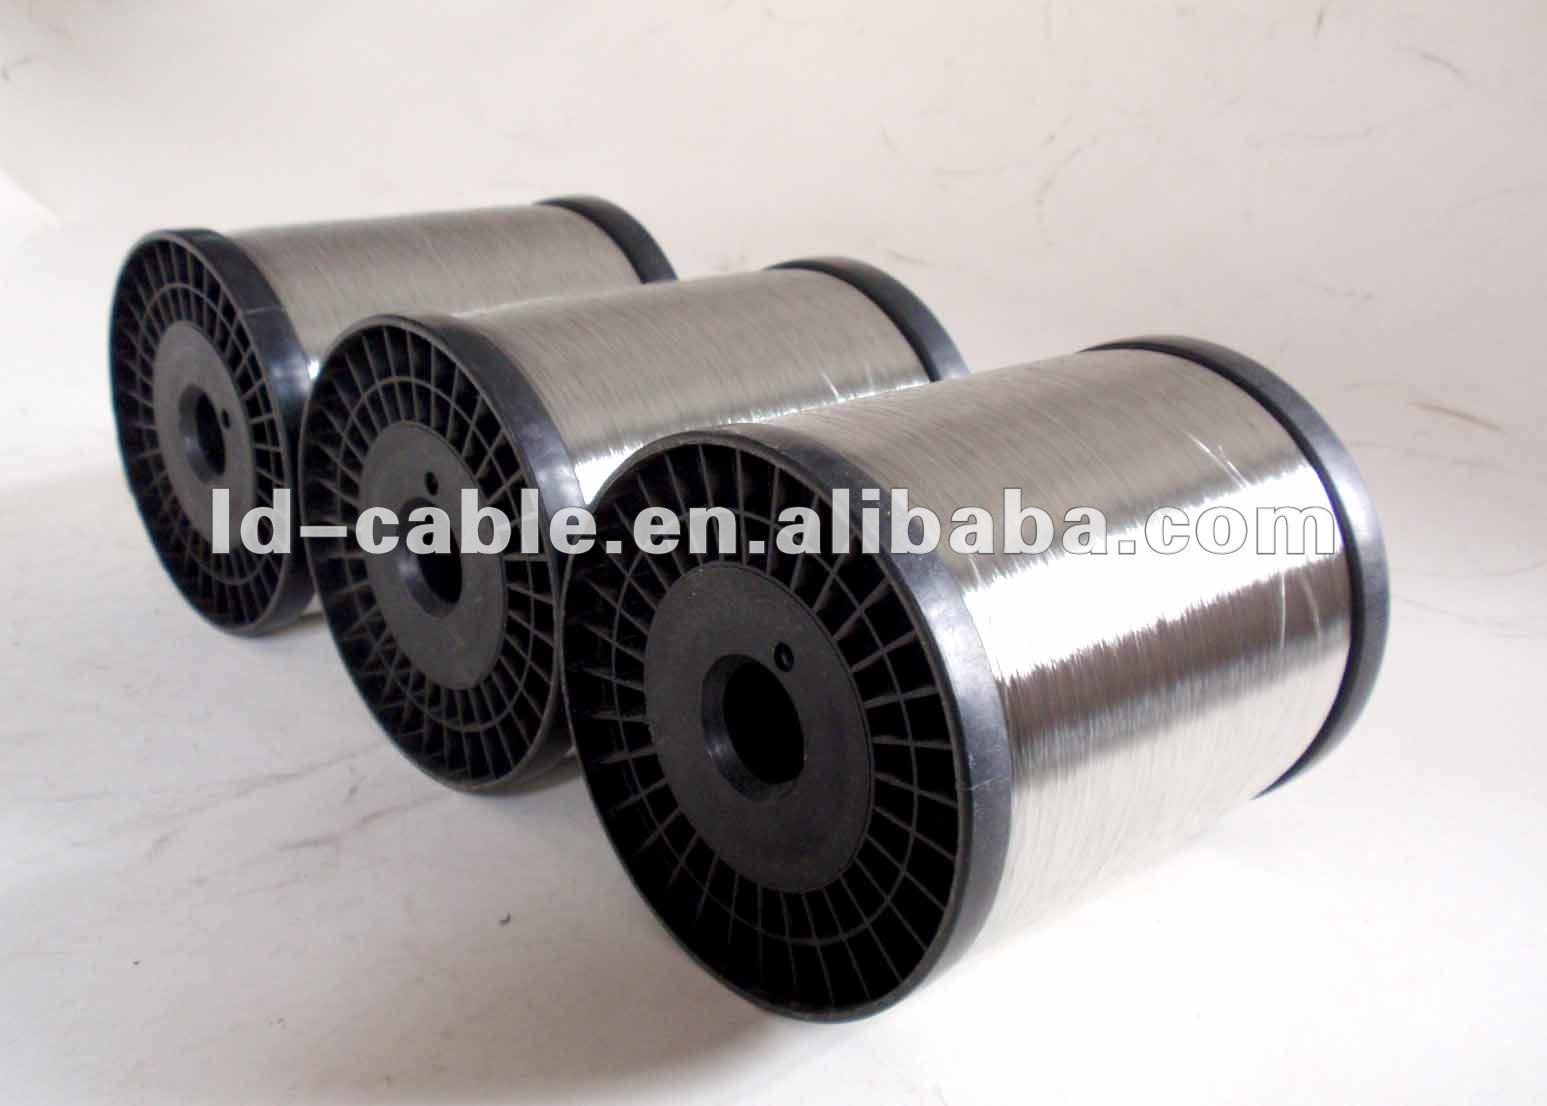 0.50 mm de cobre estañado de alambre de aluminio revestido